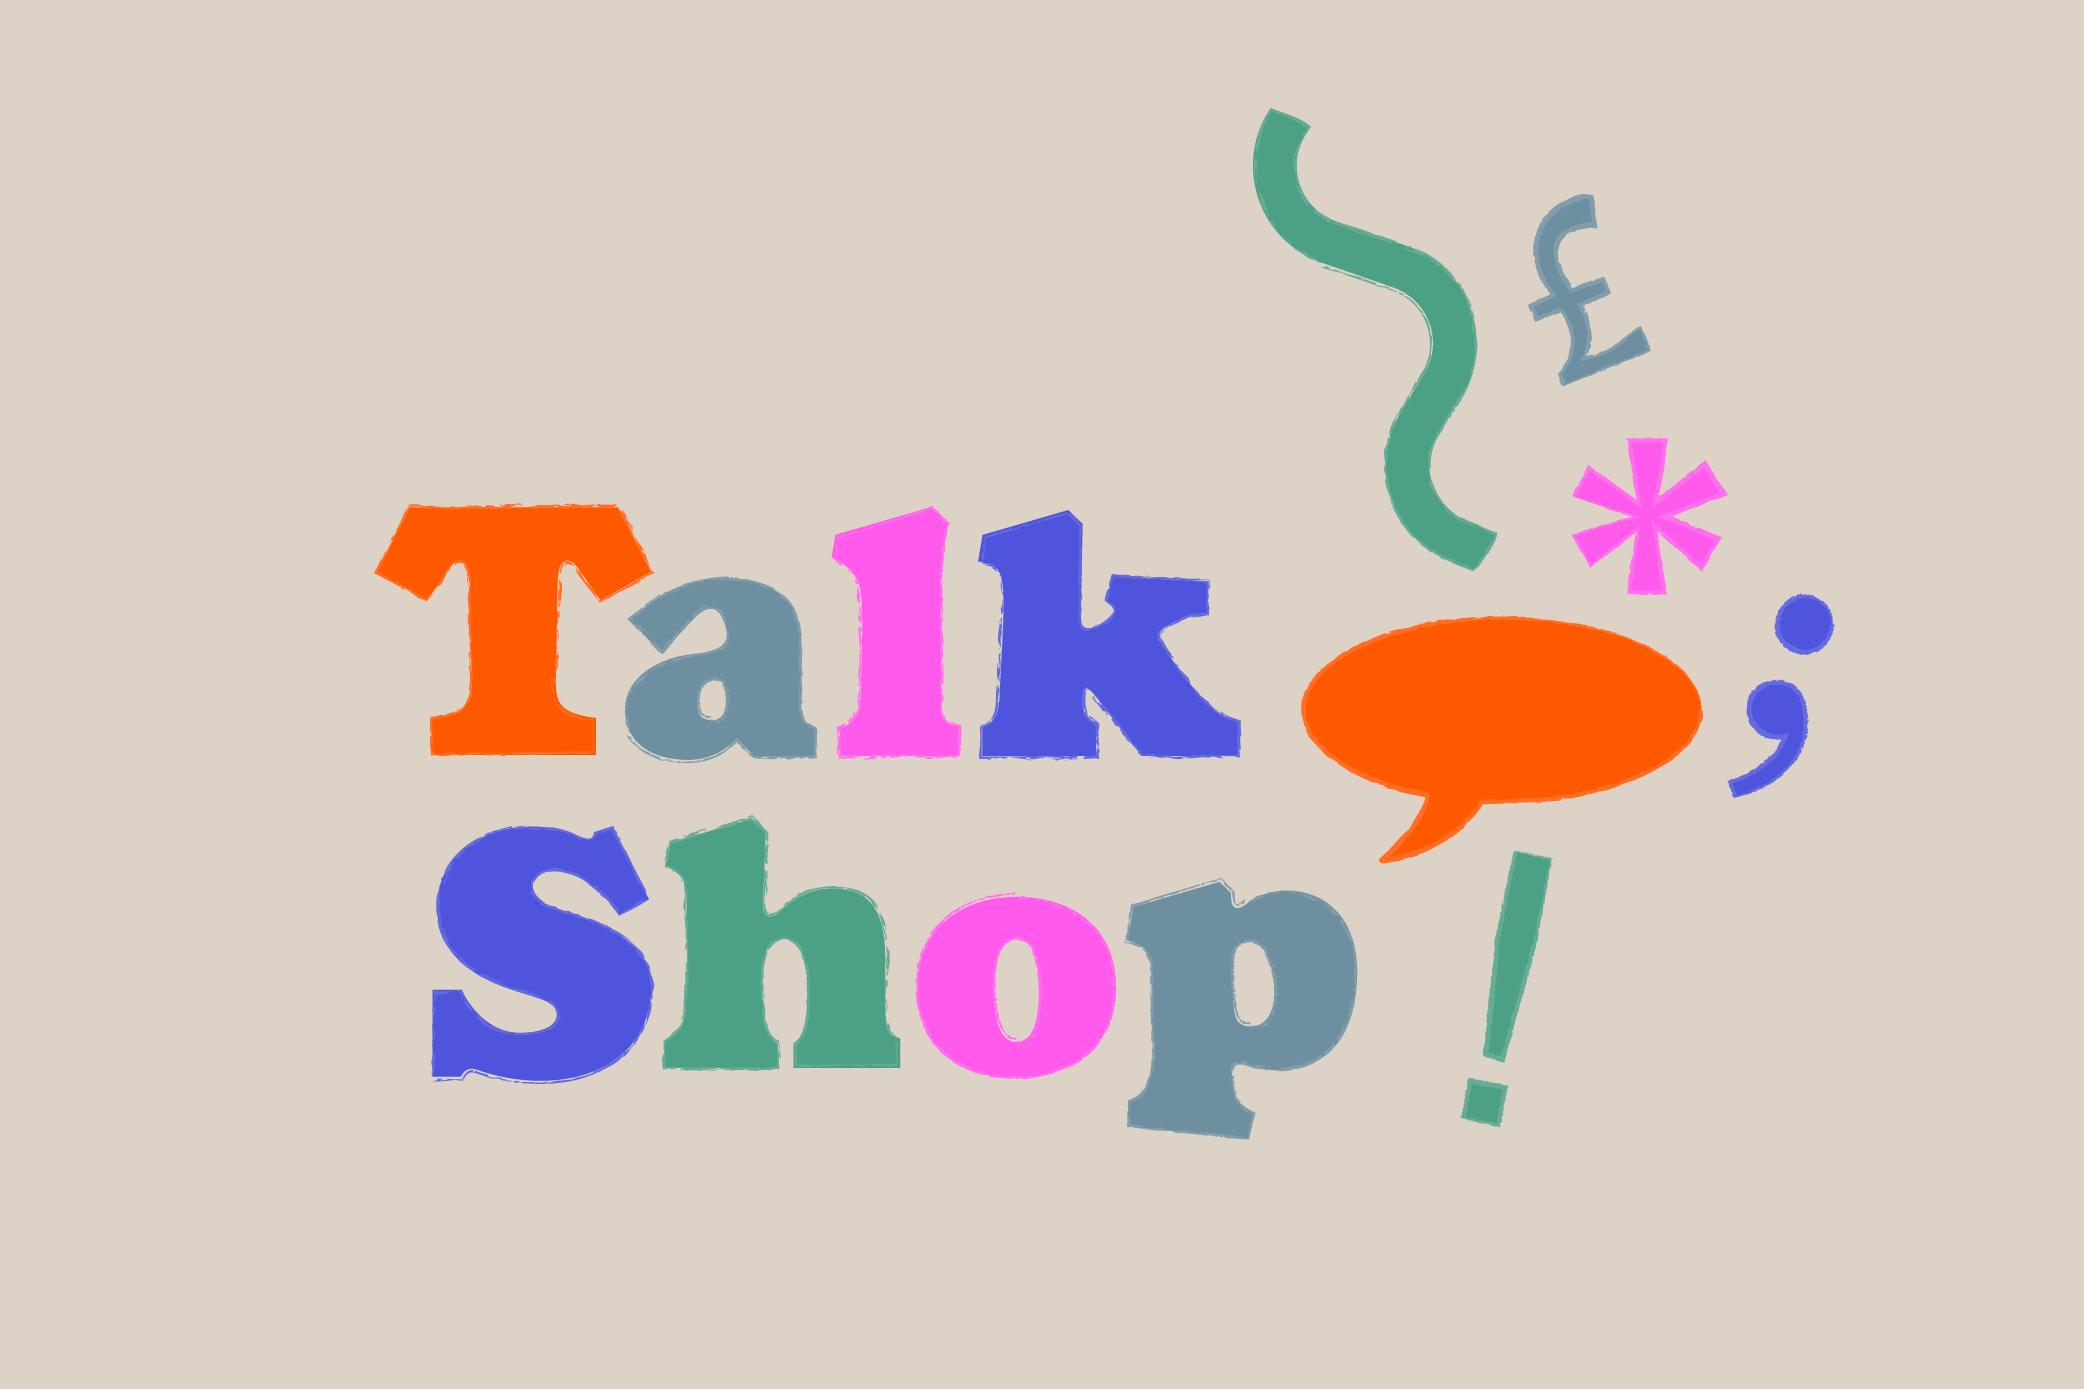 Talk Shop Cover Image